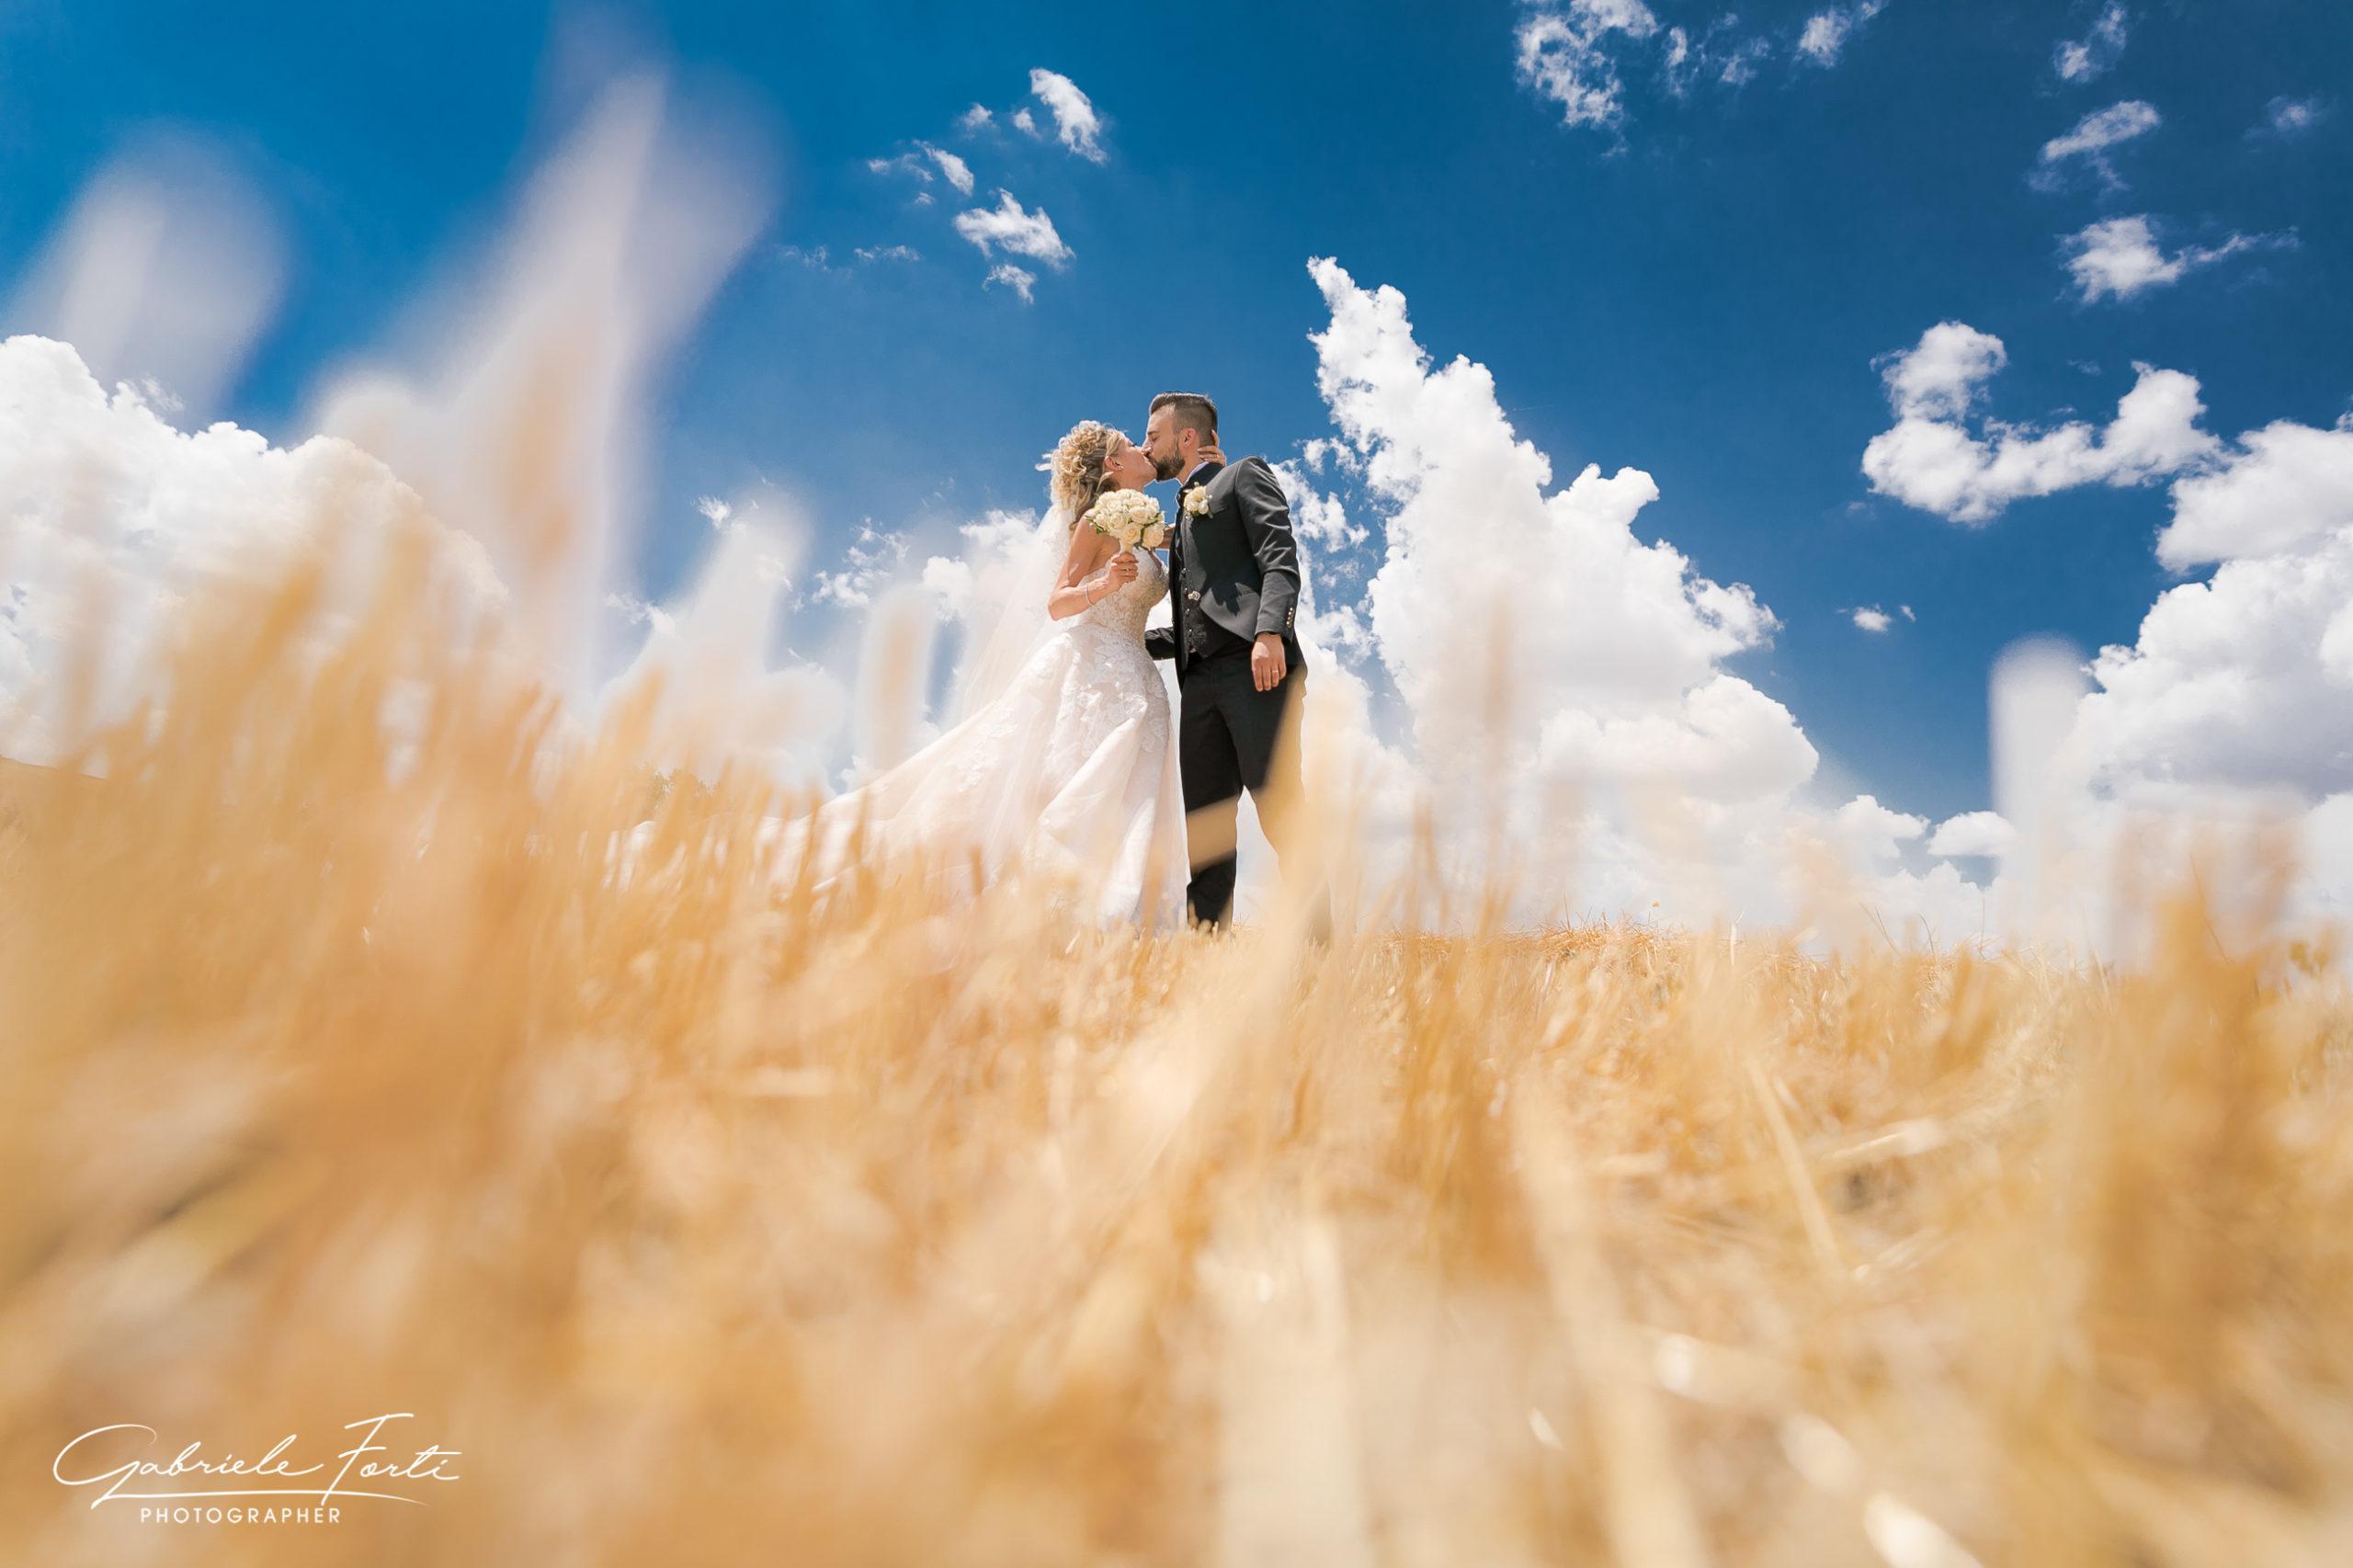 la-rimbecca-wedding-matrimonio-piancastagnaio-fotografo-foto-forti-gabriele-1